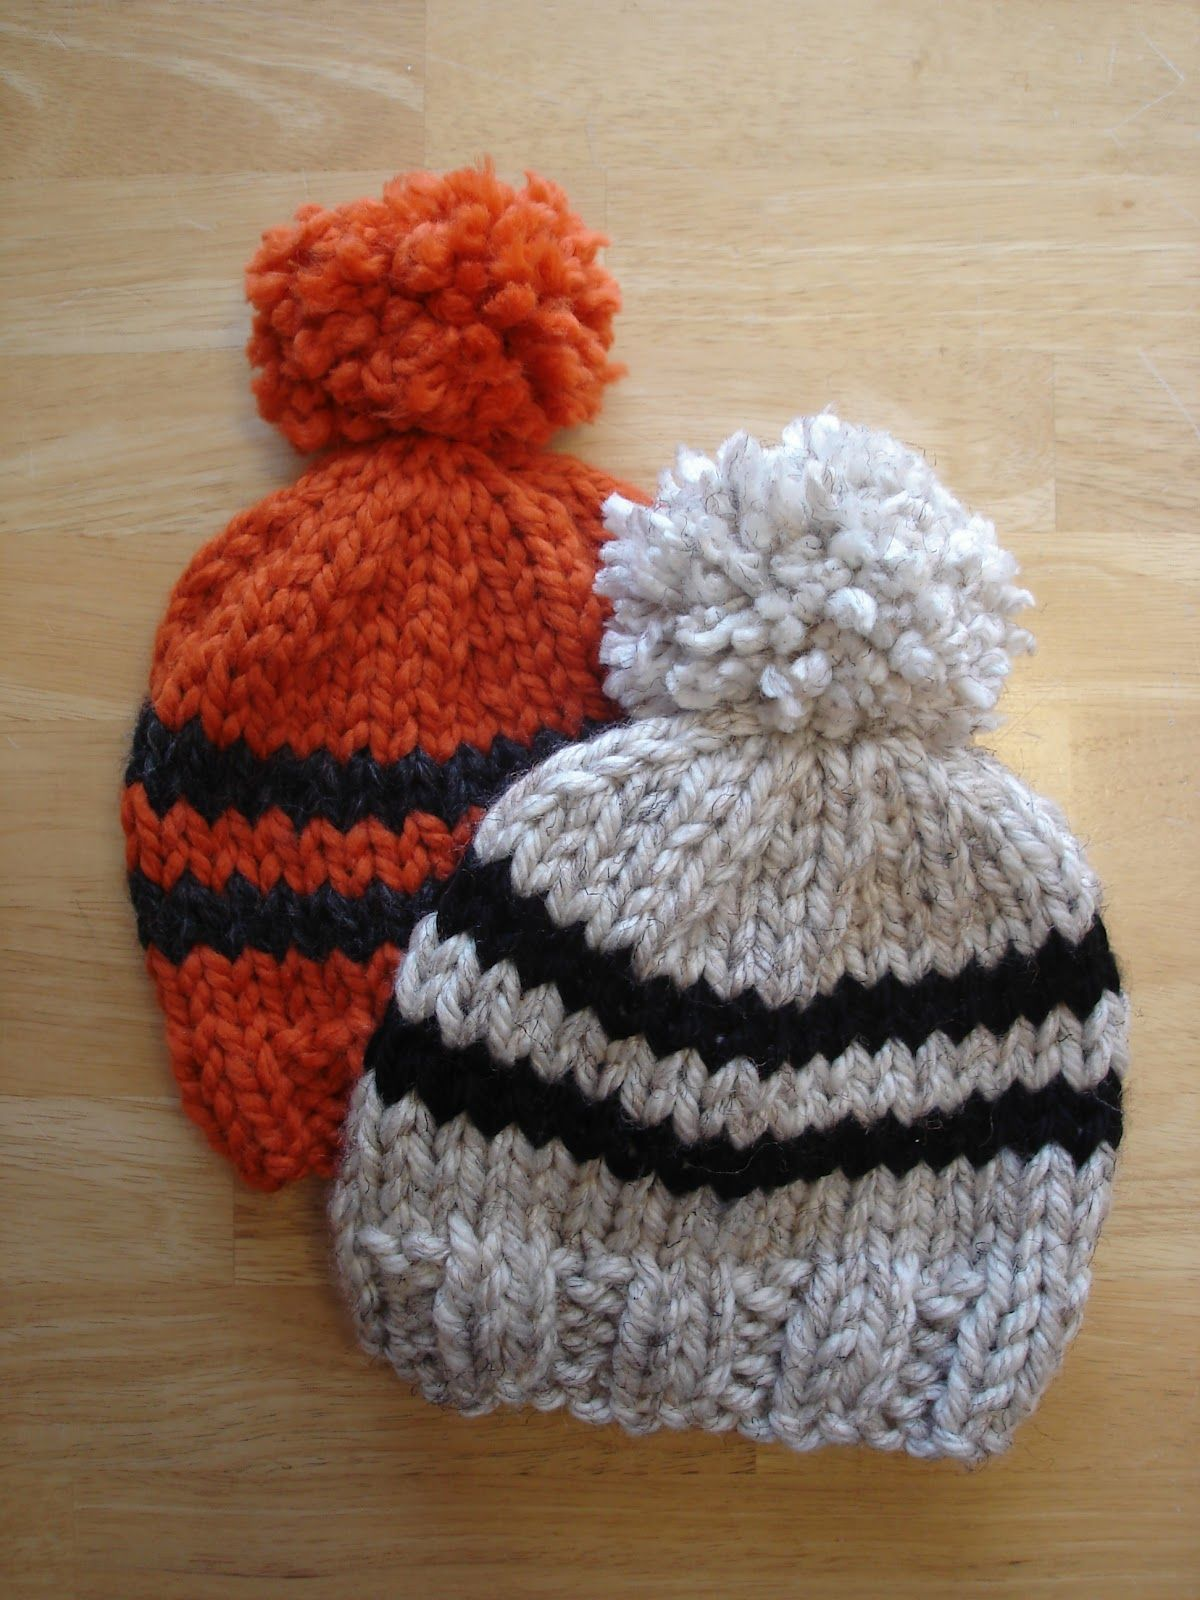 Free Knitting Pattern Preschooler Rugby Hat Baby Hats Knitting Baby Hat Knitting Pattern Knitting Patterns Free Hats